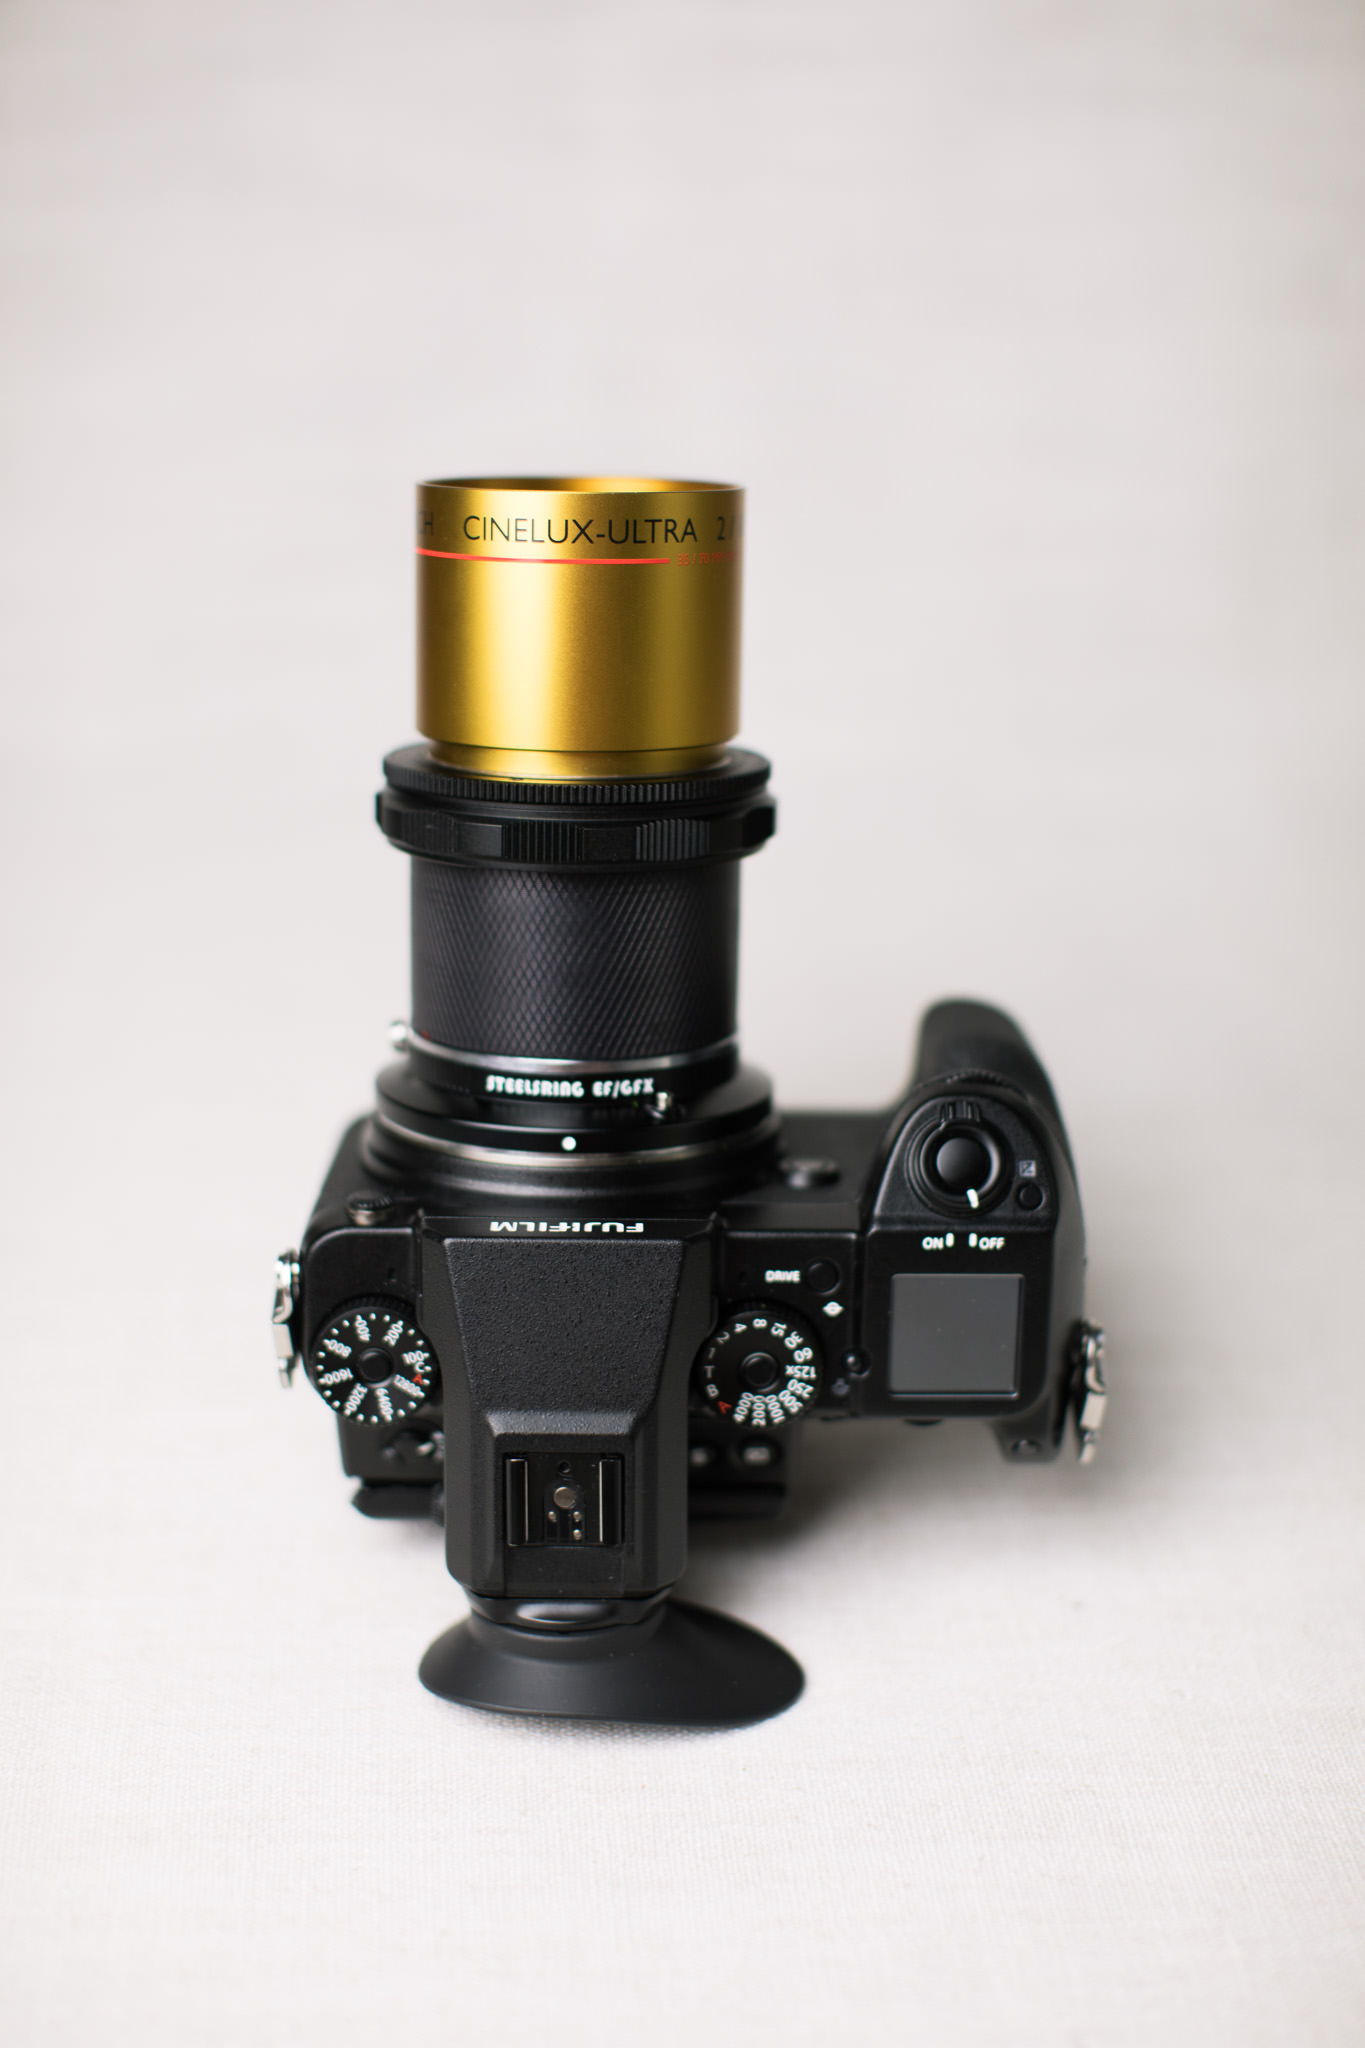 Fujifilm GFX with Schneider Cinelux Ultra MC 105mm f/2